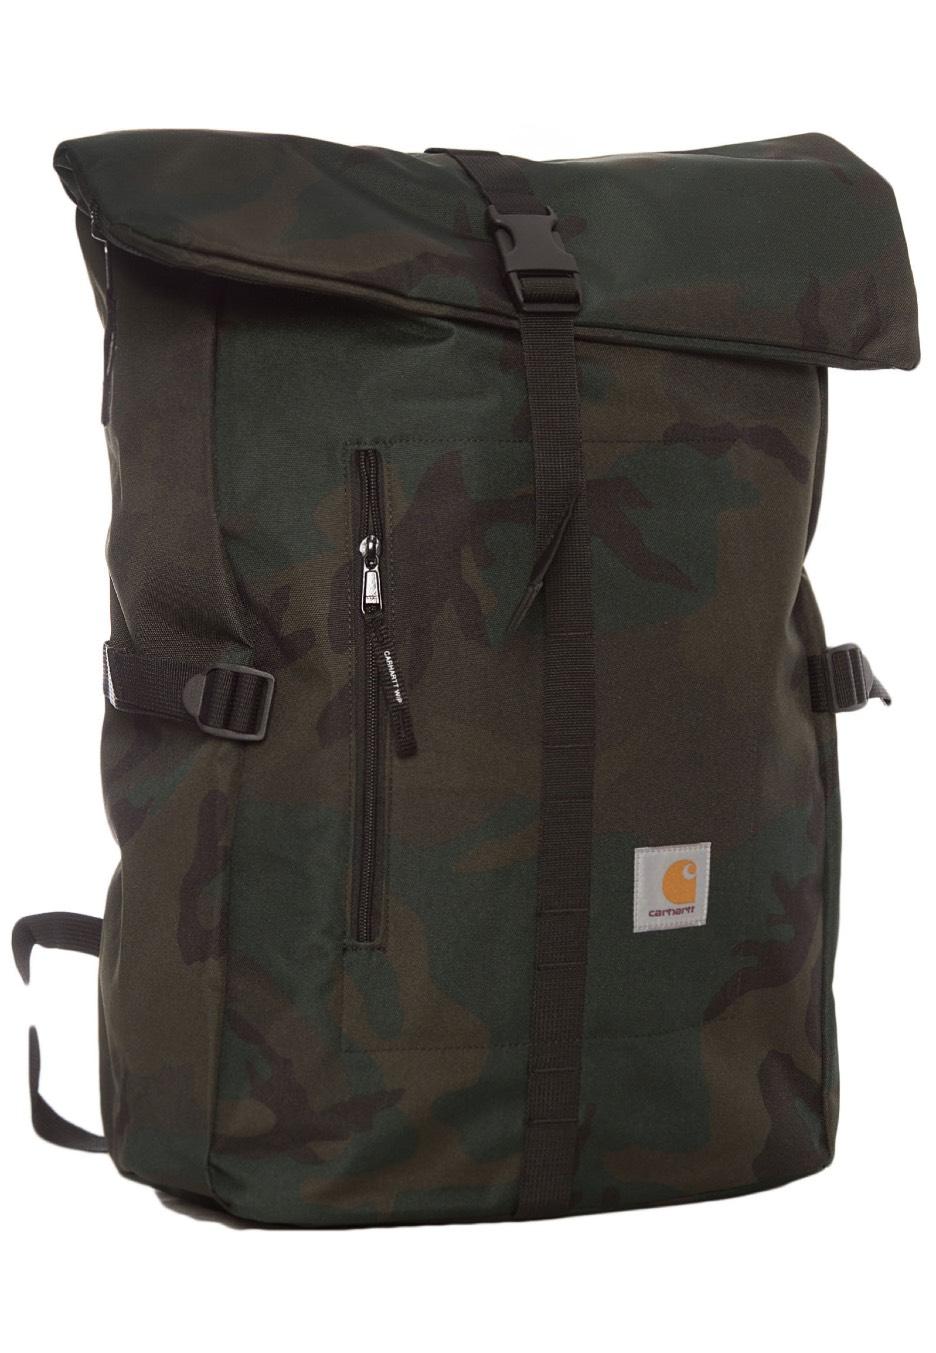 Carhartt WIP - Phil Camo Combat Green - Backpack - Streetwear Shop -  Impericon.com Worldwide